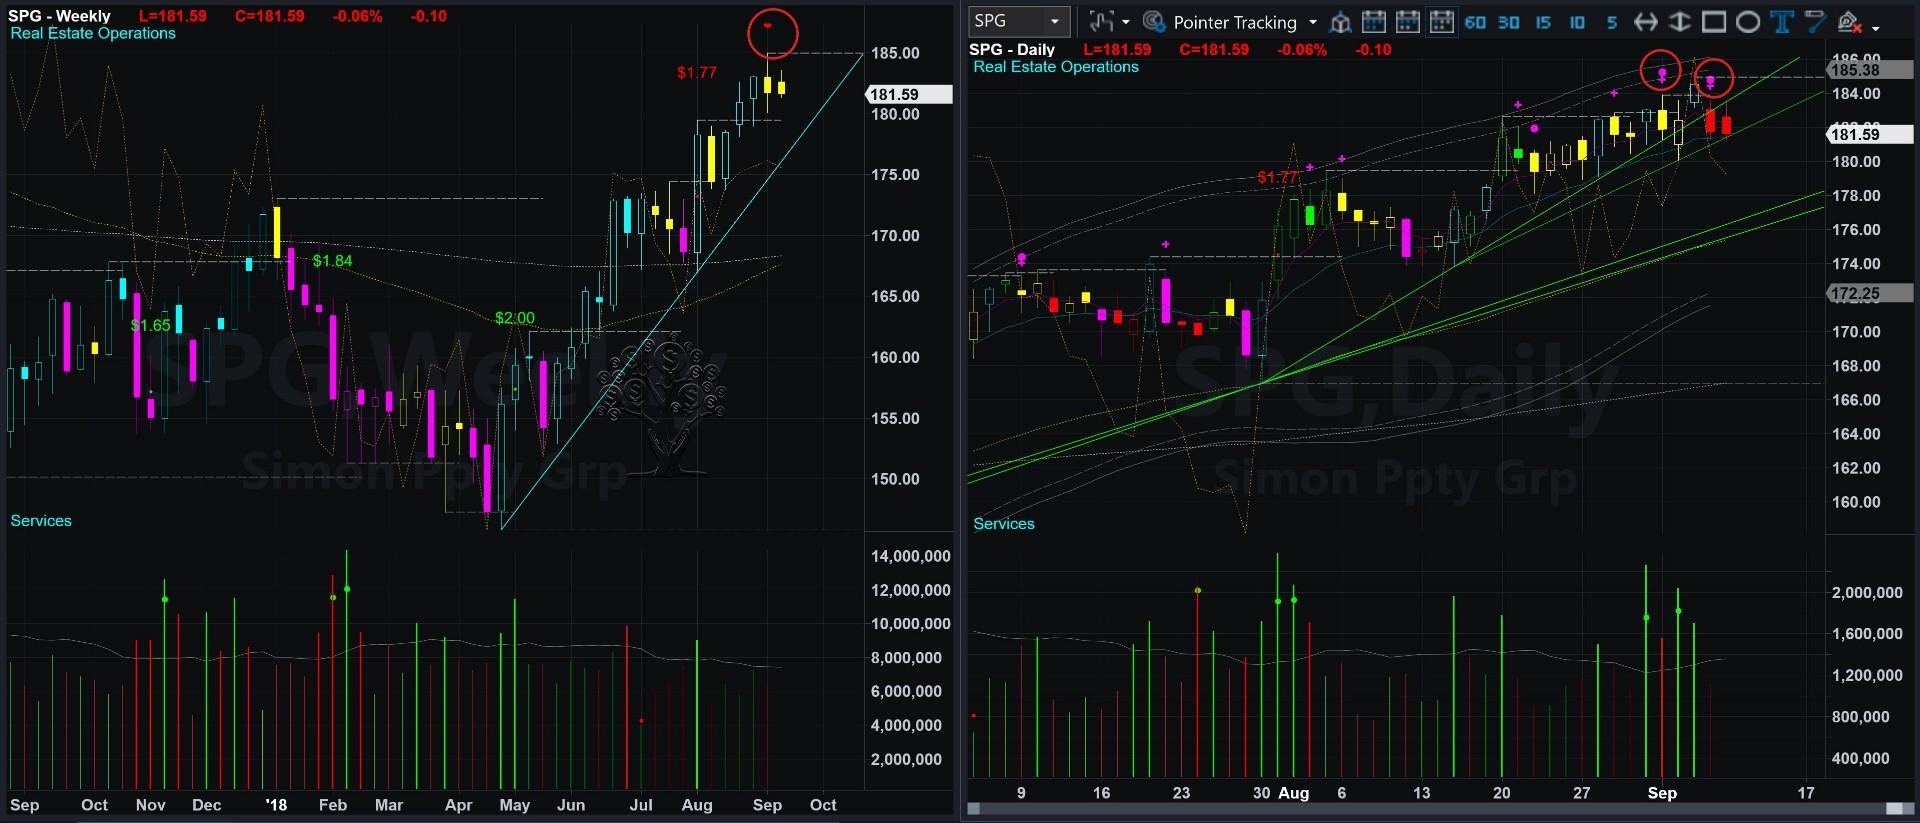 SPG charts 2018-09-10_11-42-38.jpg